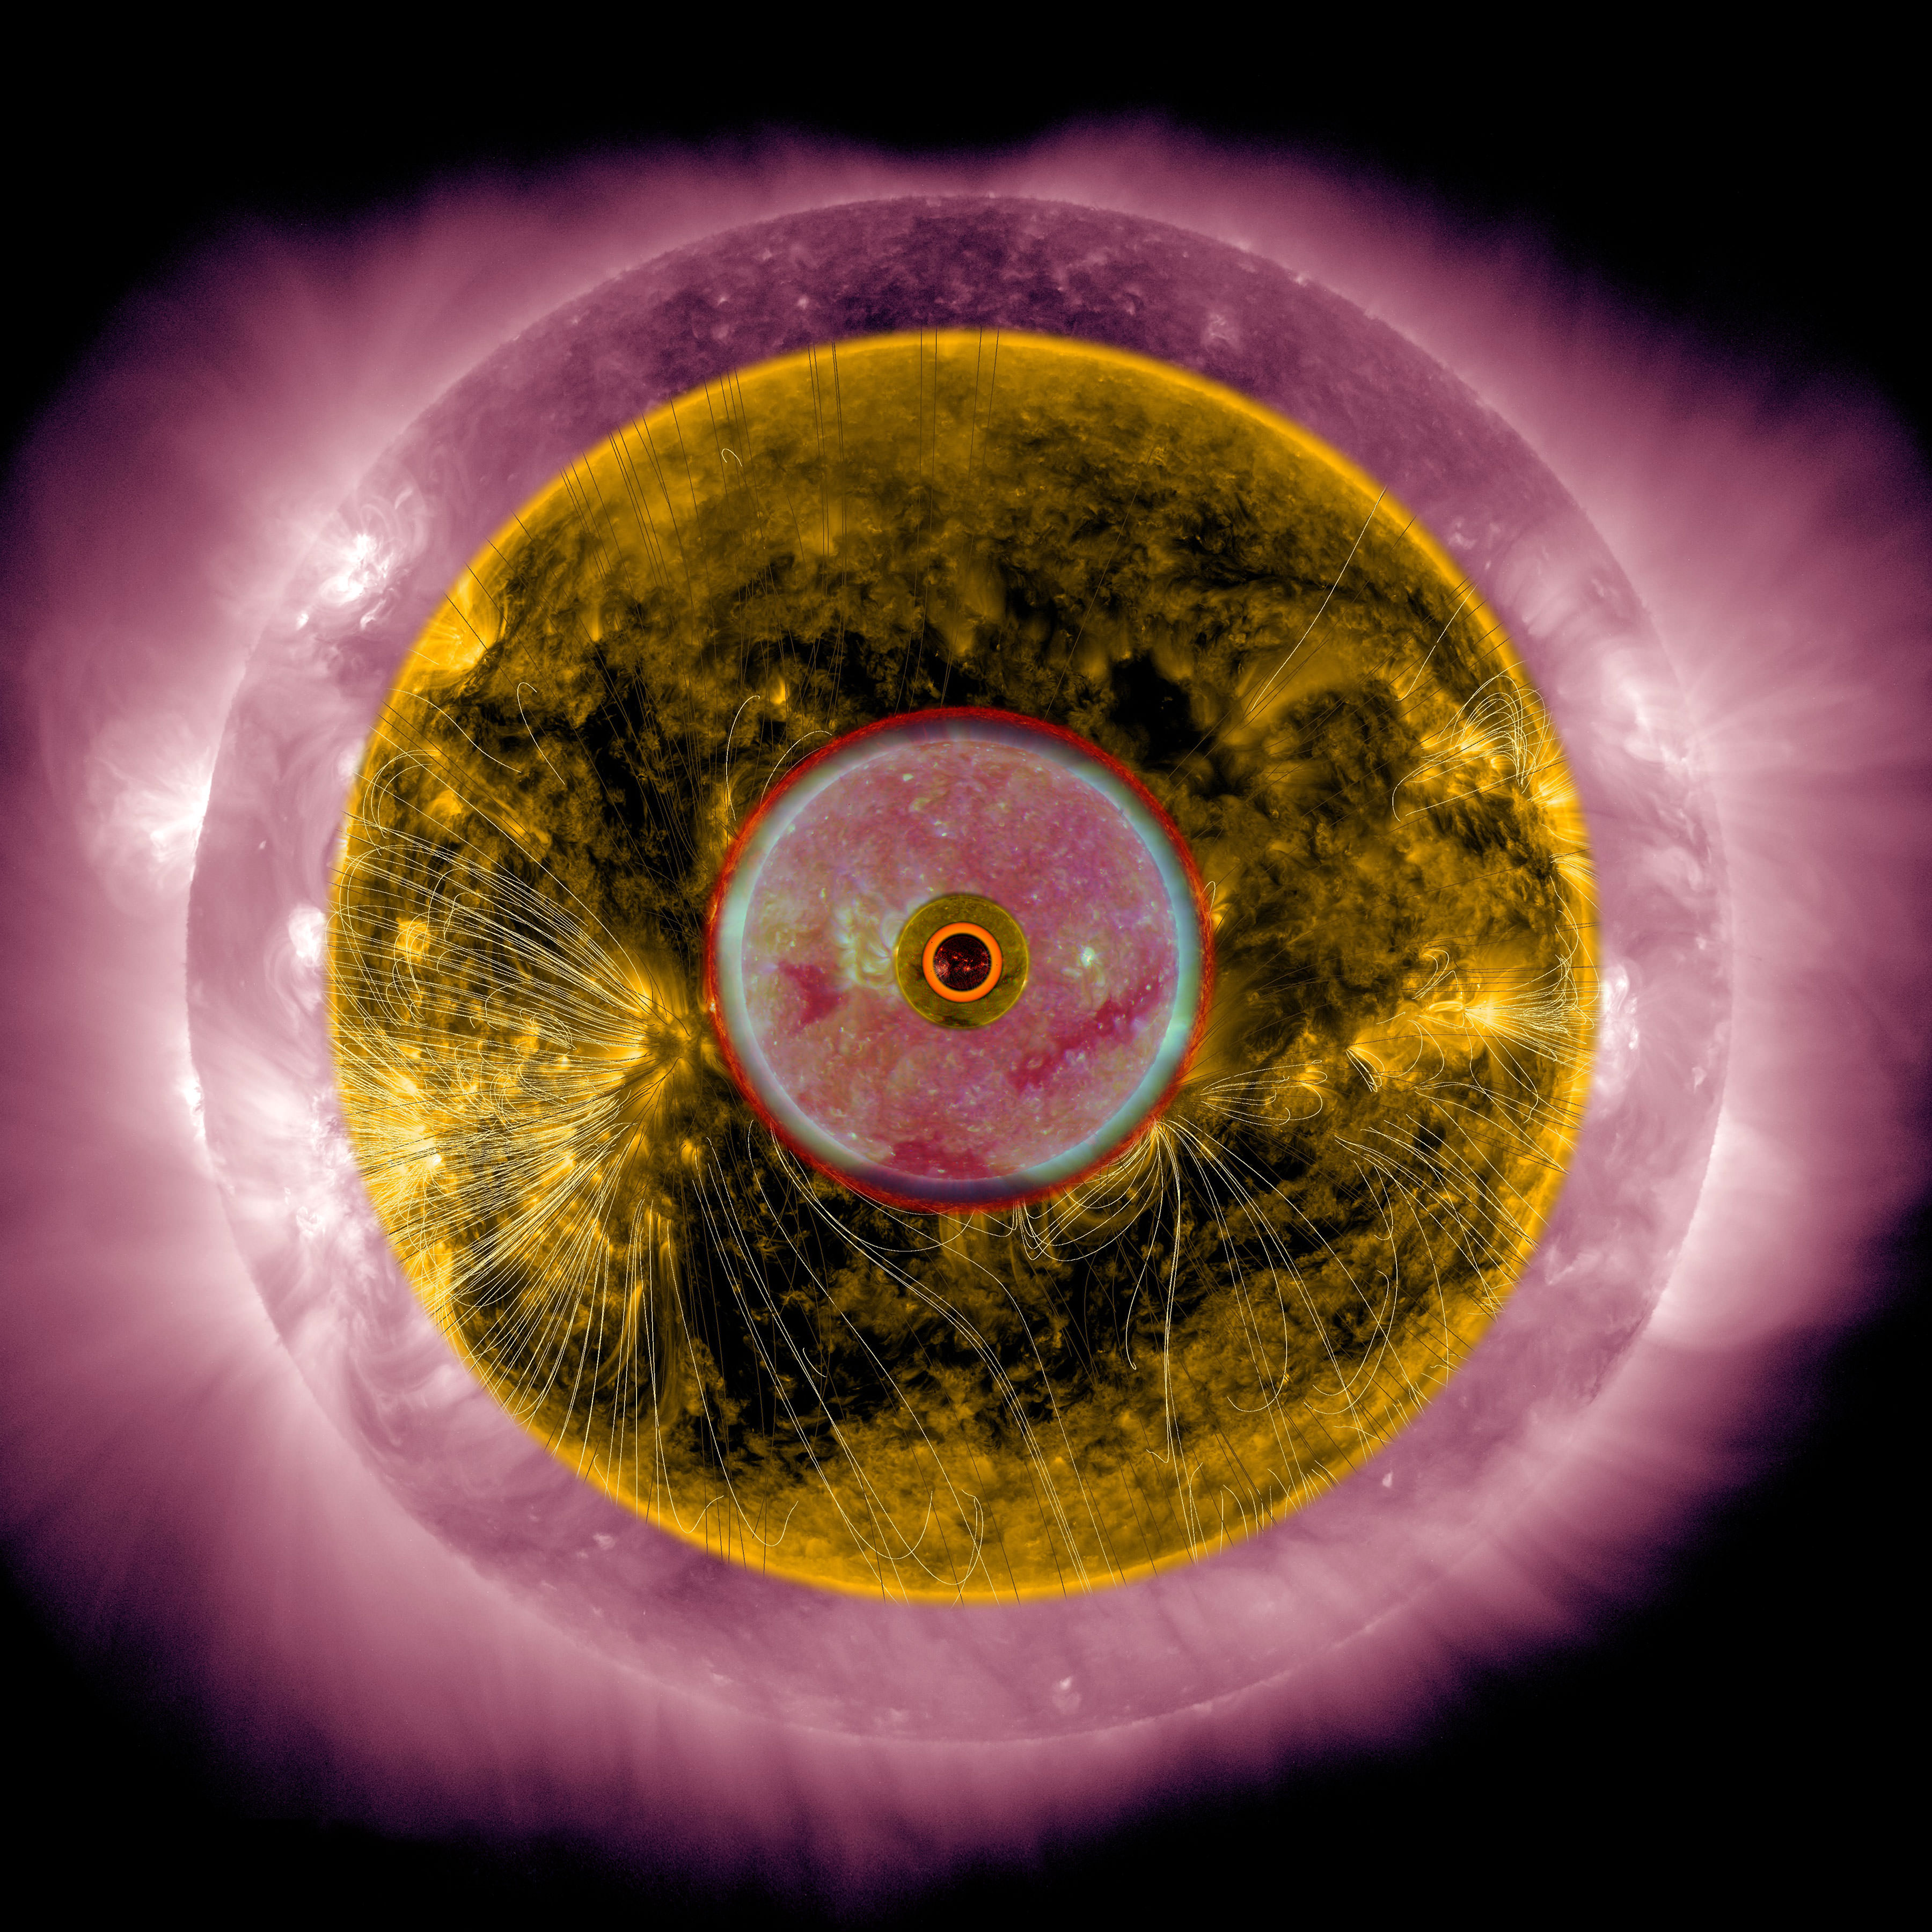 Scott Massey, Suns as Relative Planetary Scale 1, 2015 Archival inkjet print, 40.5 x 40.5 cm  Image courtesy of the artist